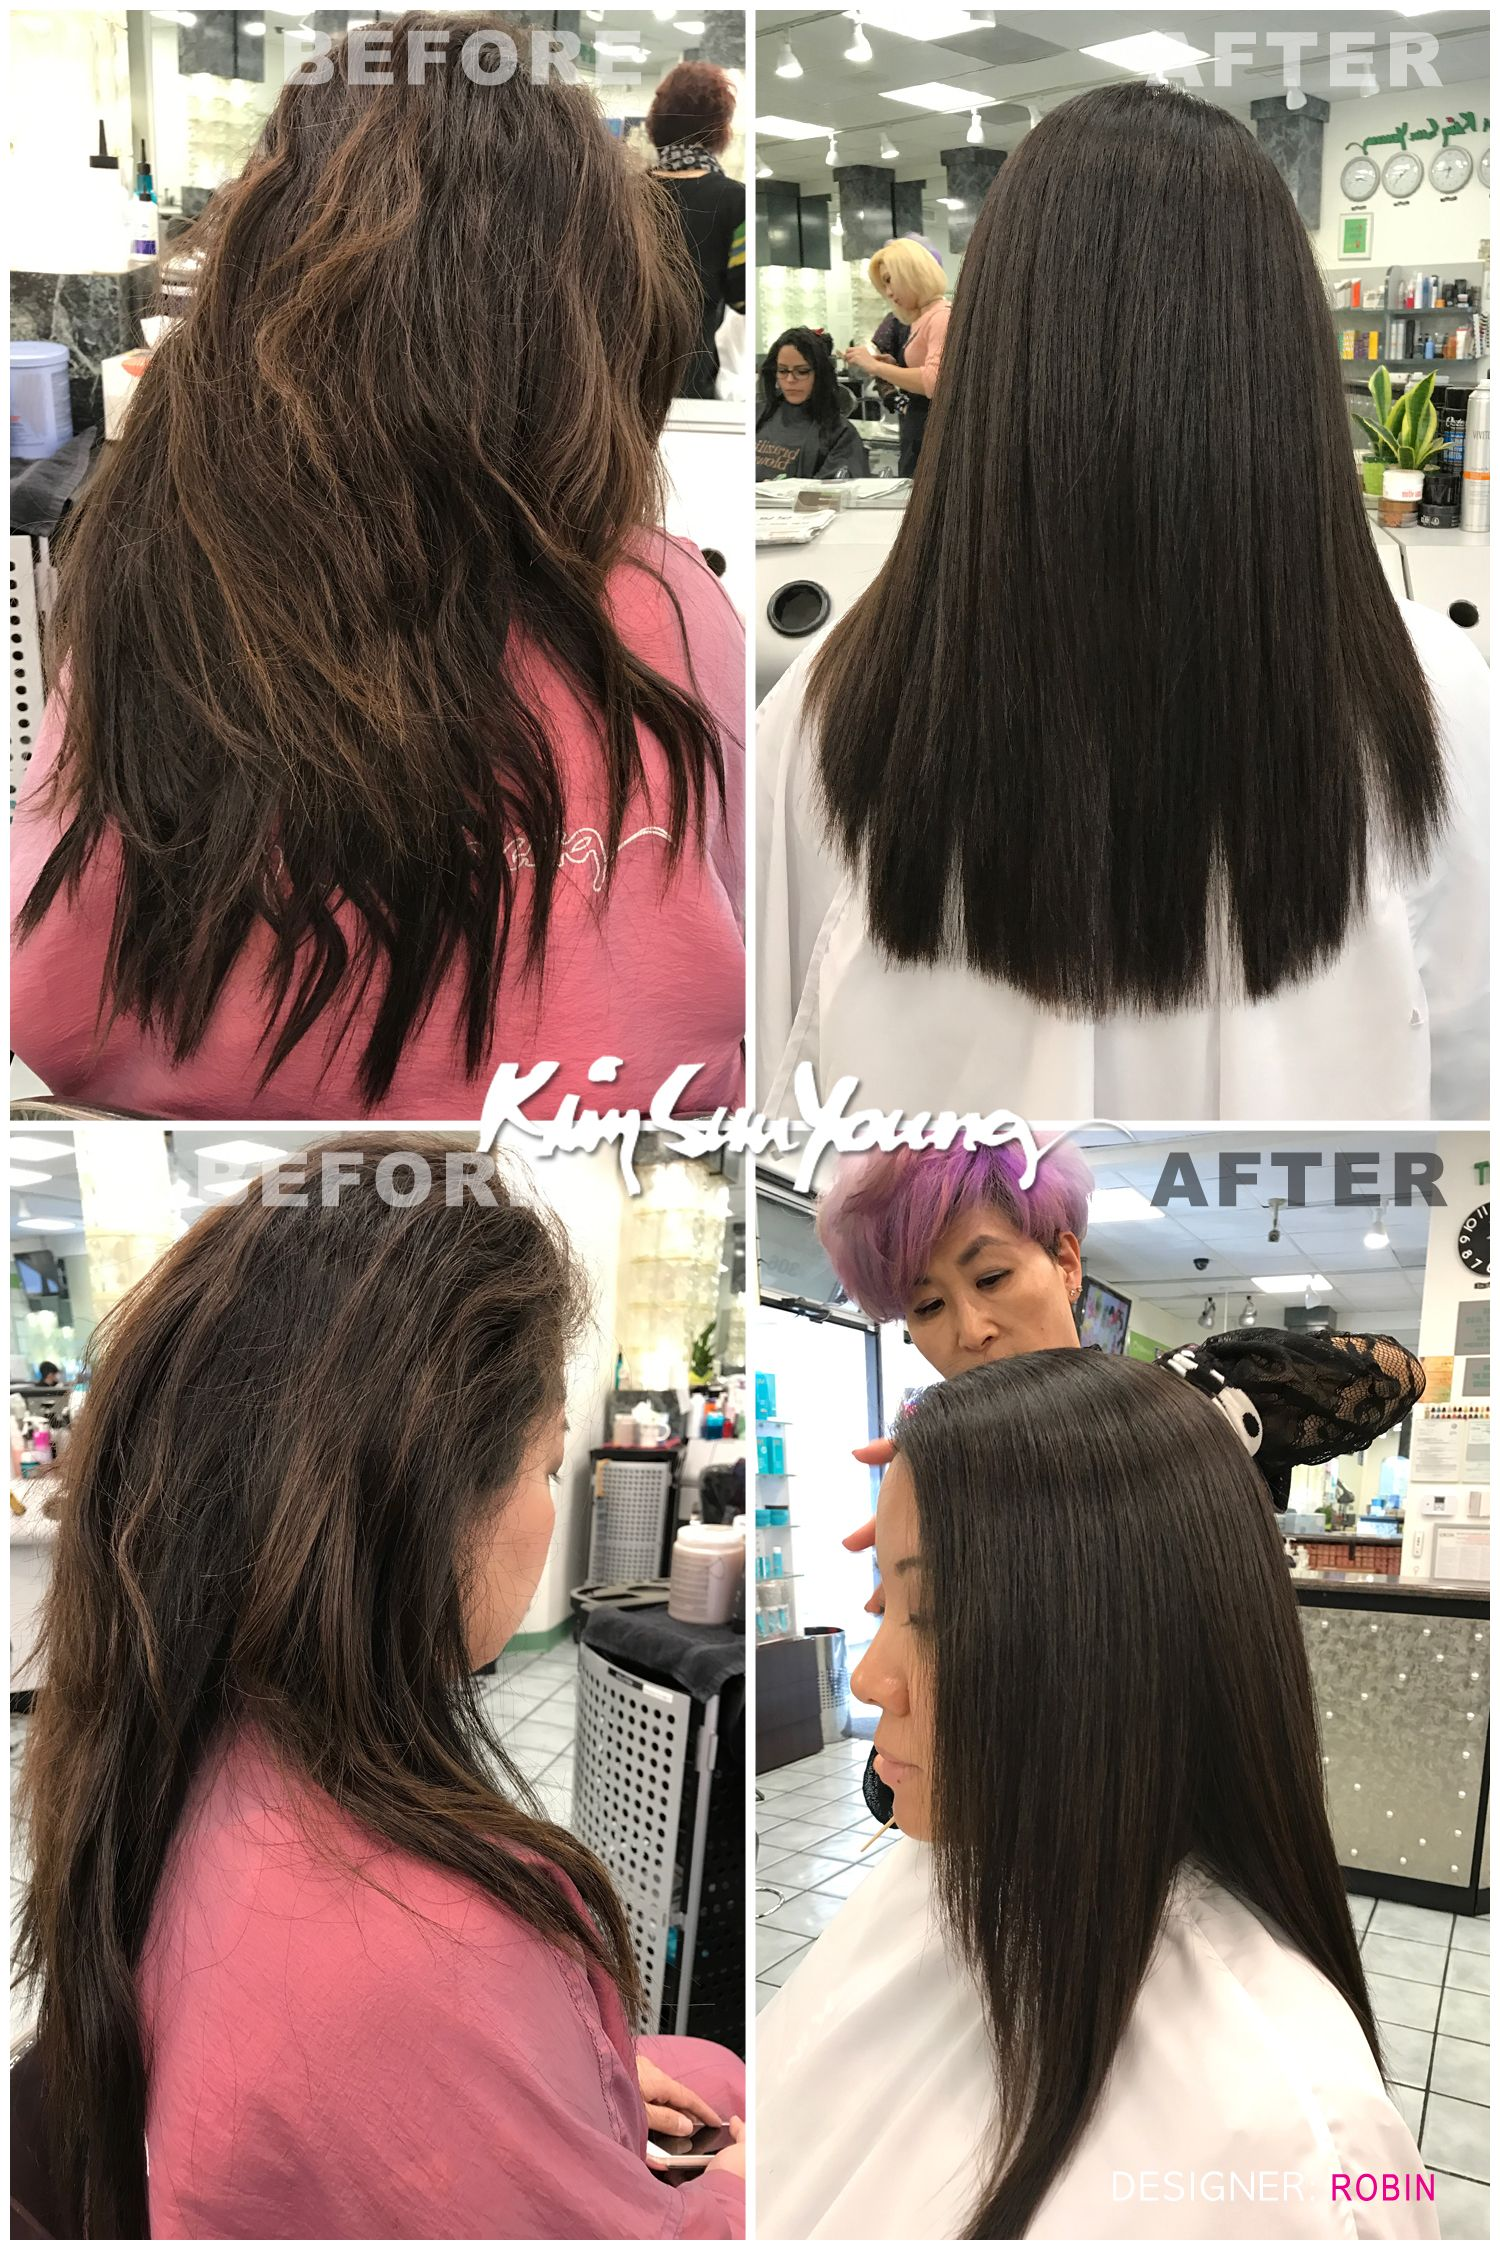 Magic Straight Perm By Robin At Ksy Kim Sun Young Beauty Salon Permed Hairstyles Hair Straightening Treatment Hair And Beauty Salon